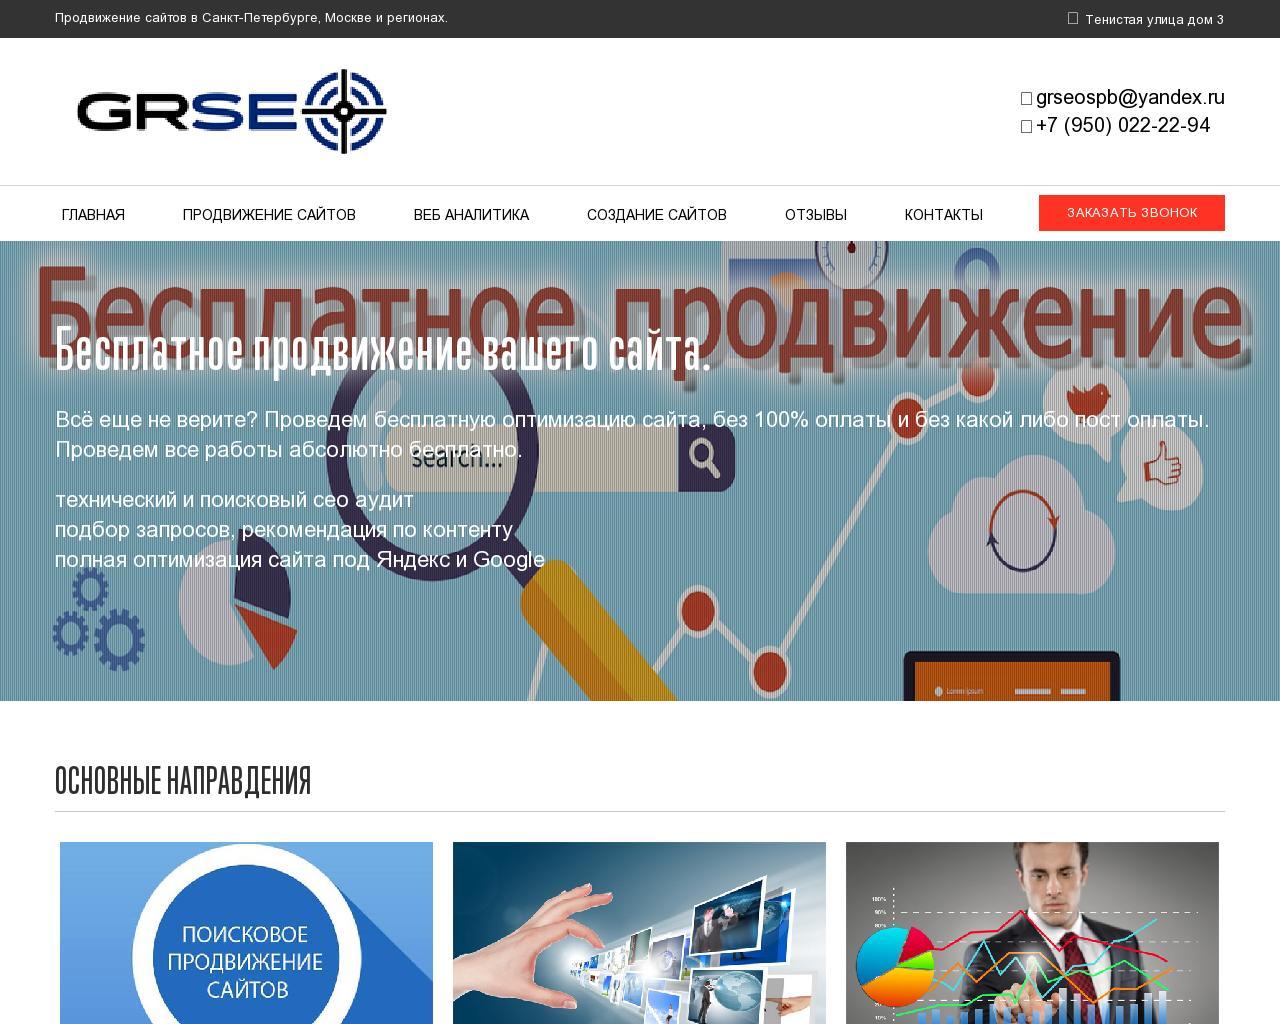 Реклама сайта петербург яндекс моя реклама липецк